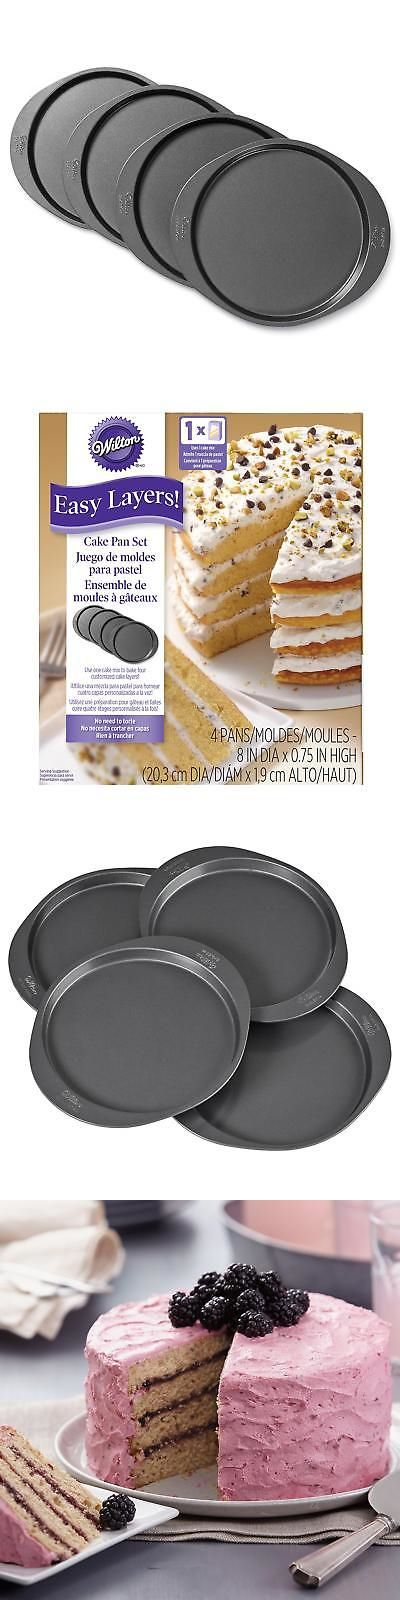 Wilton Easy Layers Round Layer Cake Pans Set, 4-Piece